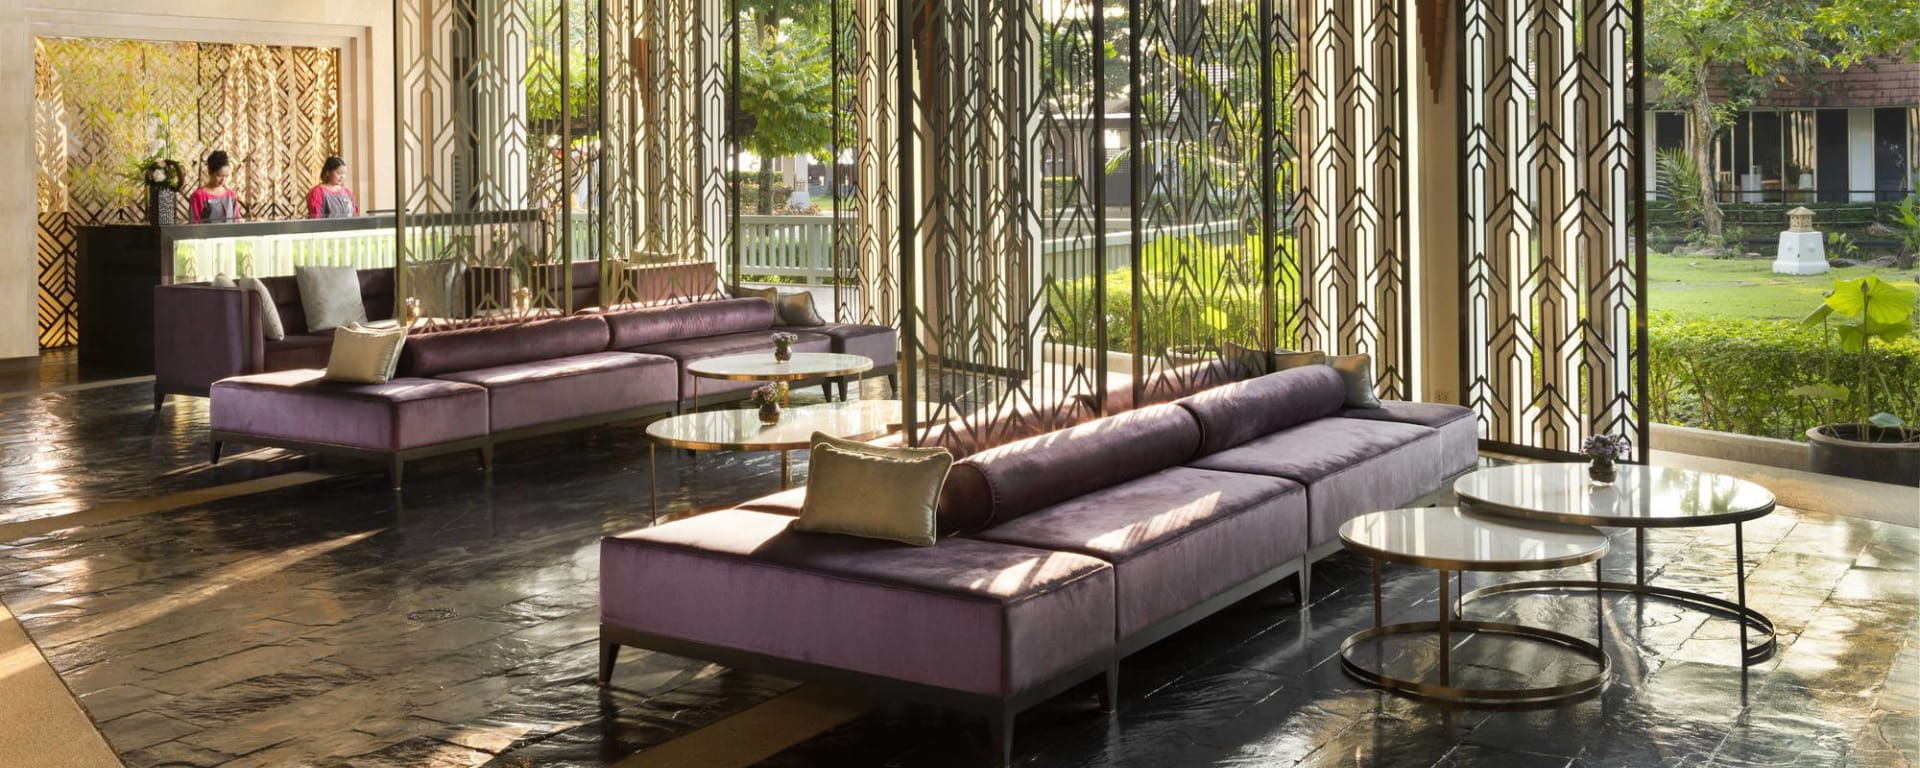 Aonang Villa in Krabi: Lobby